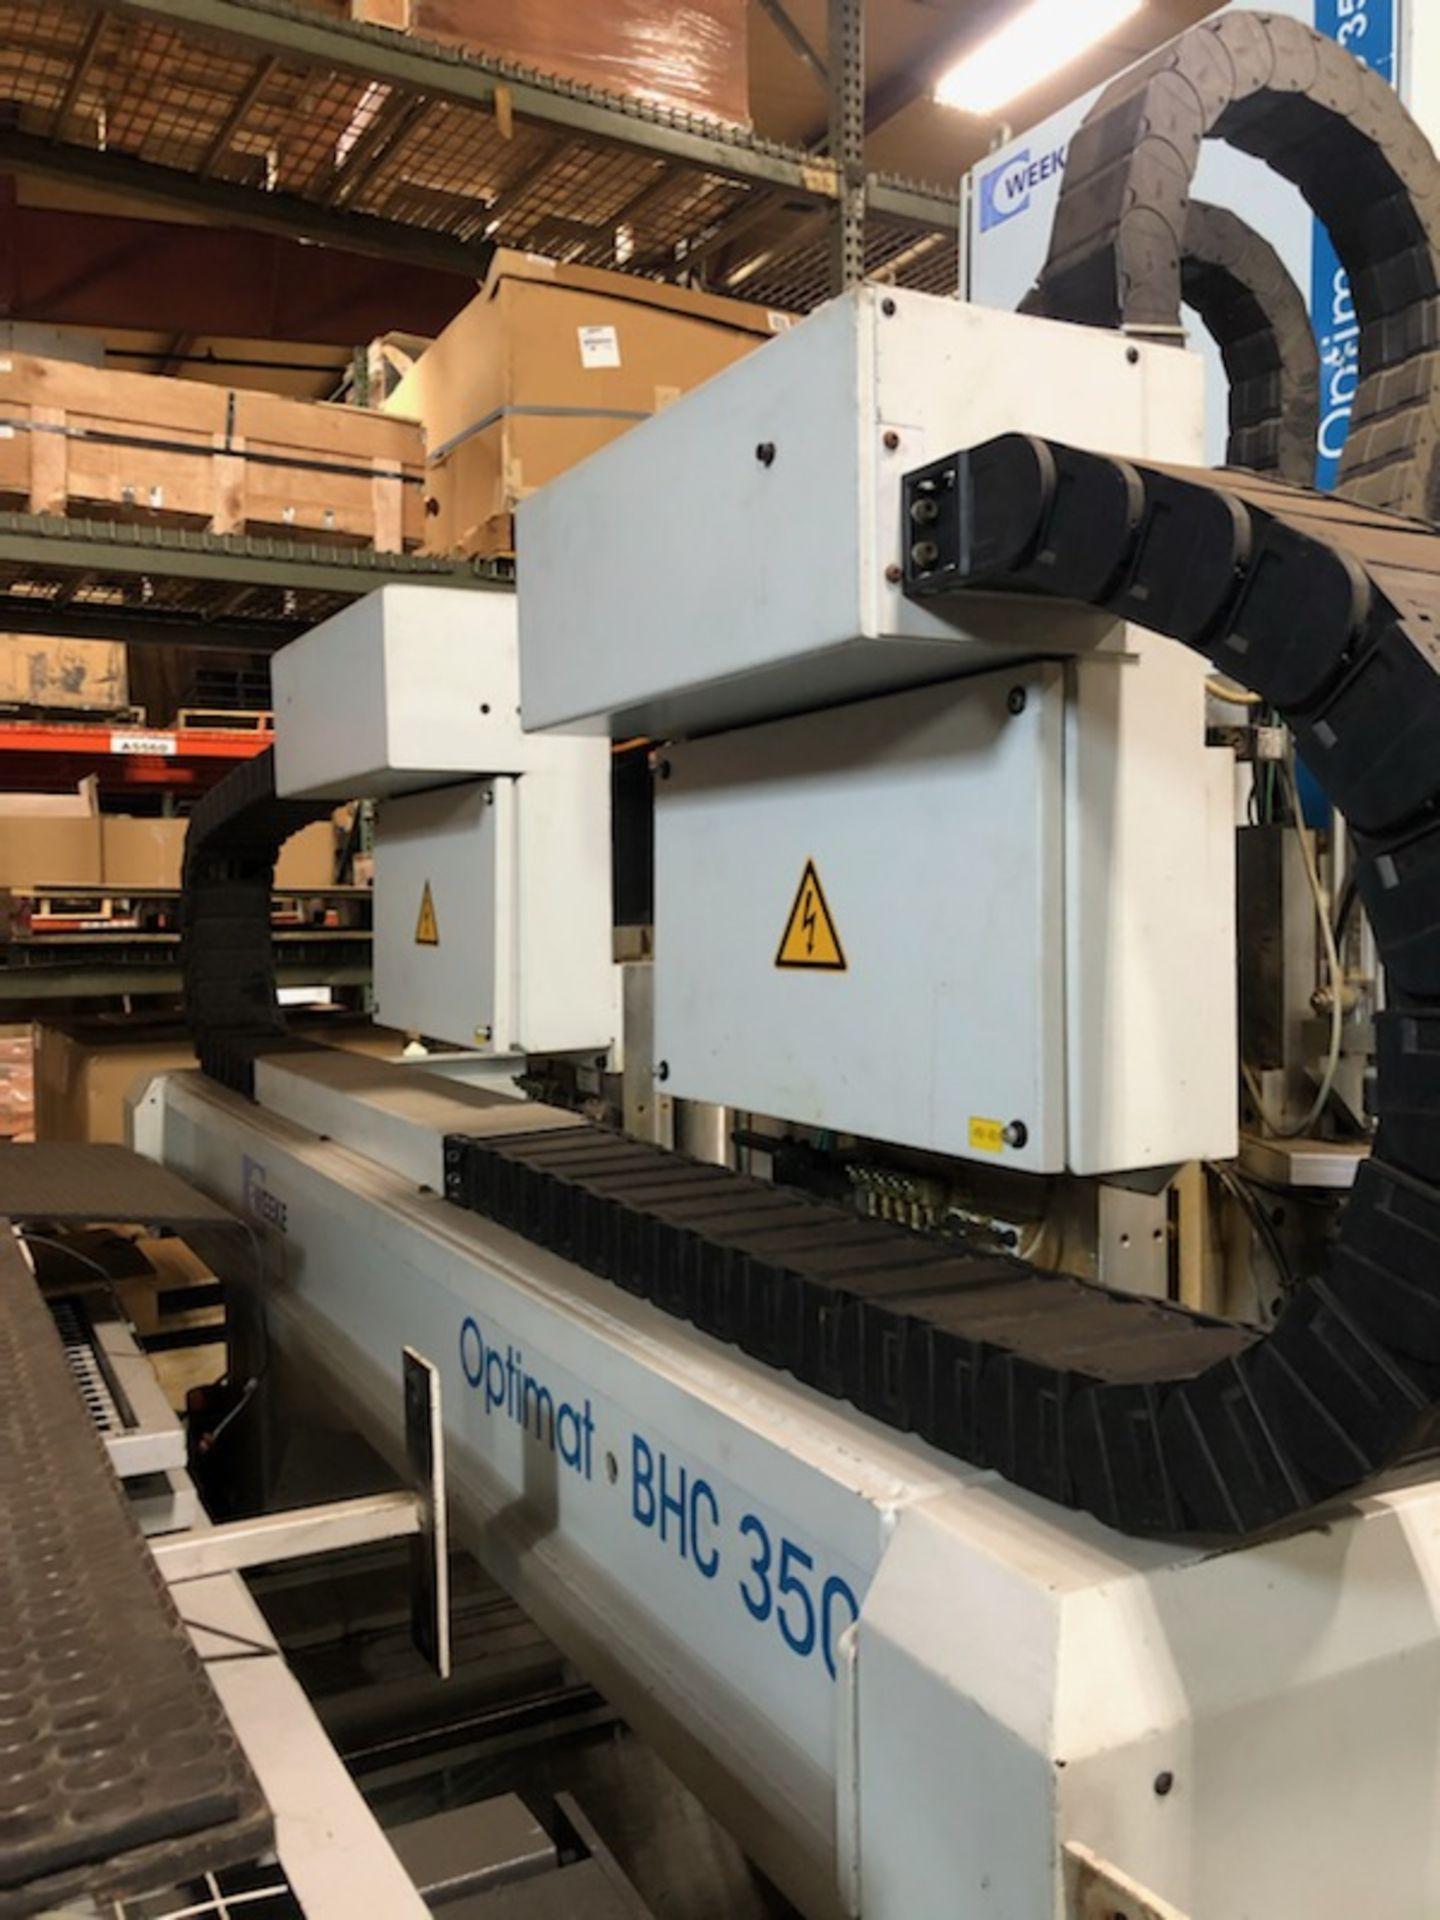 WEEKE BHC-350 Wood CNC MACHINING CENTER - Image 2 of 11